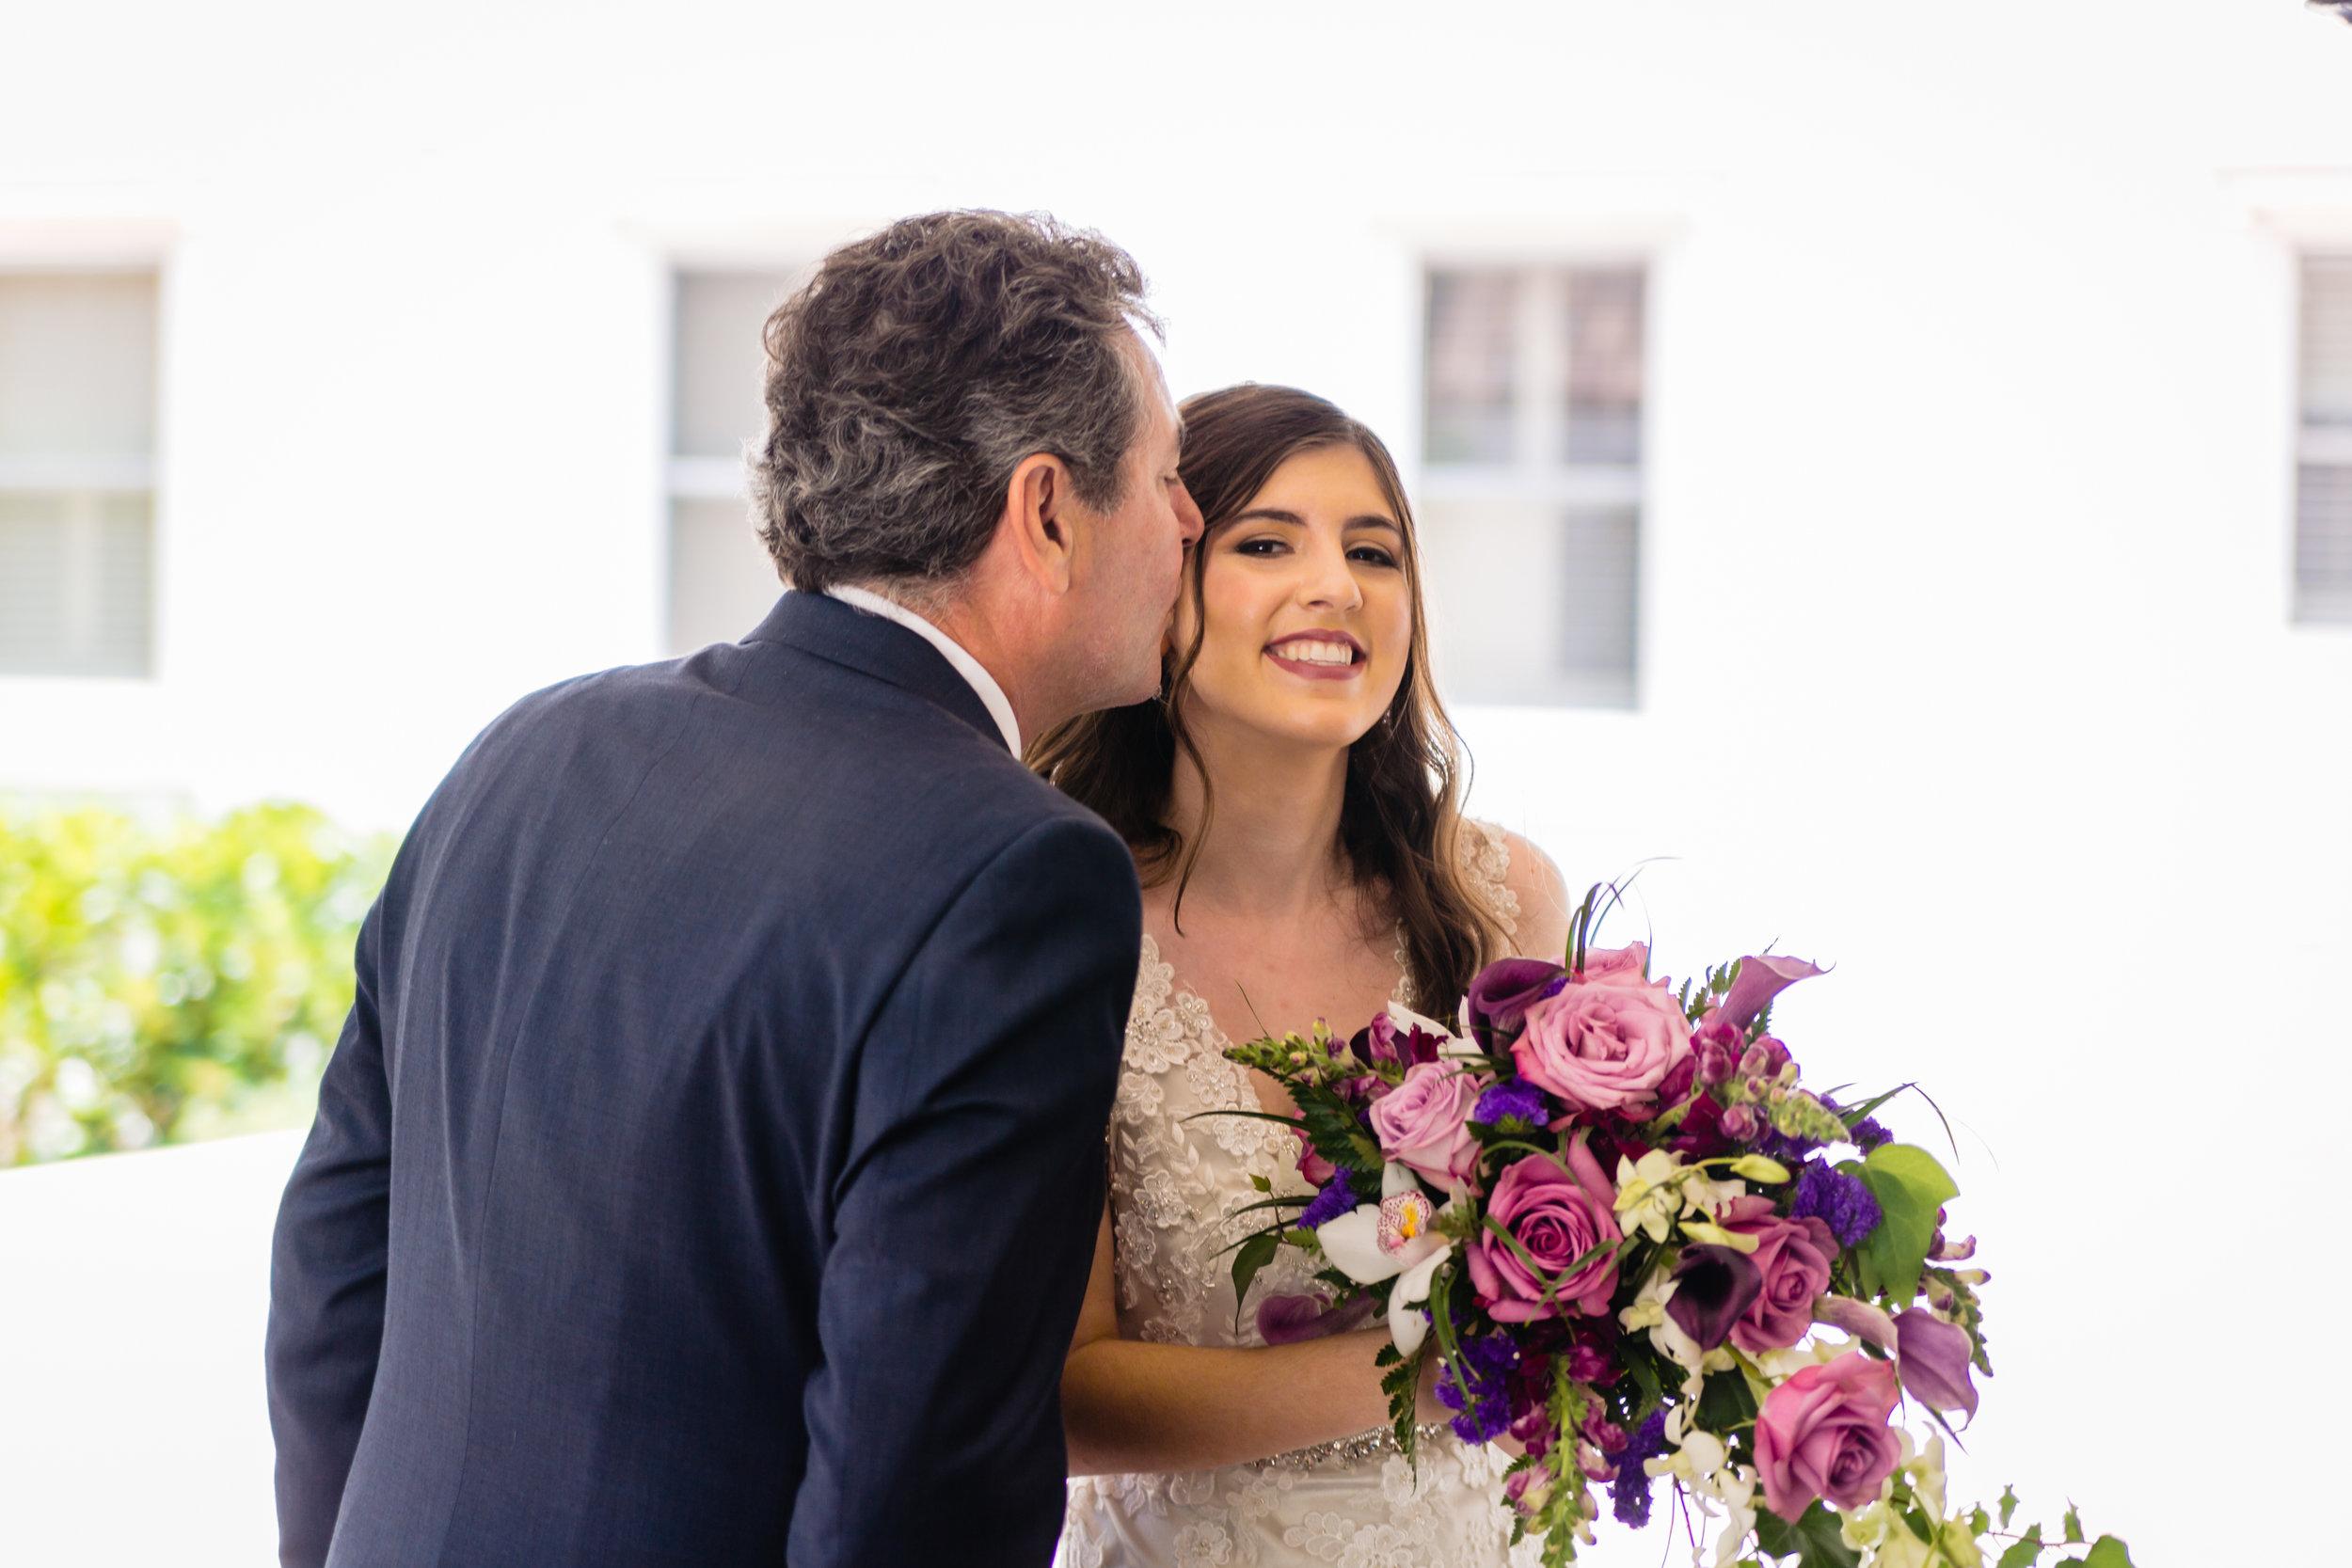 HAH_Zoe and Daniel_Clearwater Wedding_36_2018.jpg